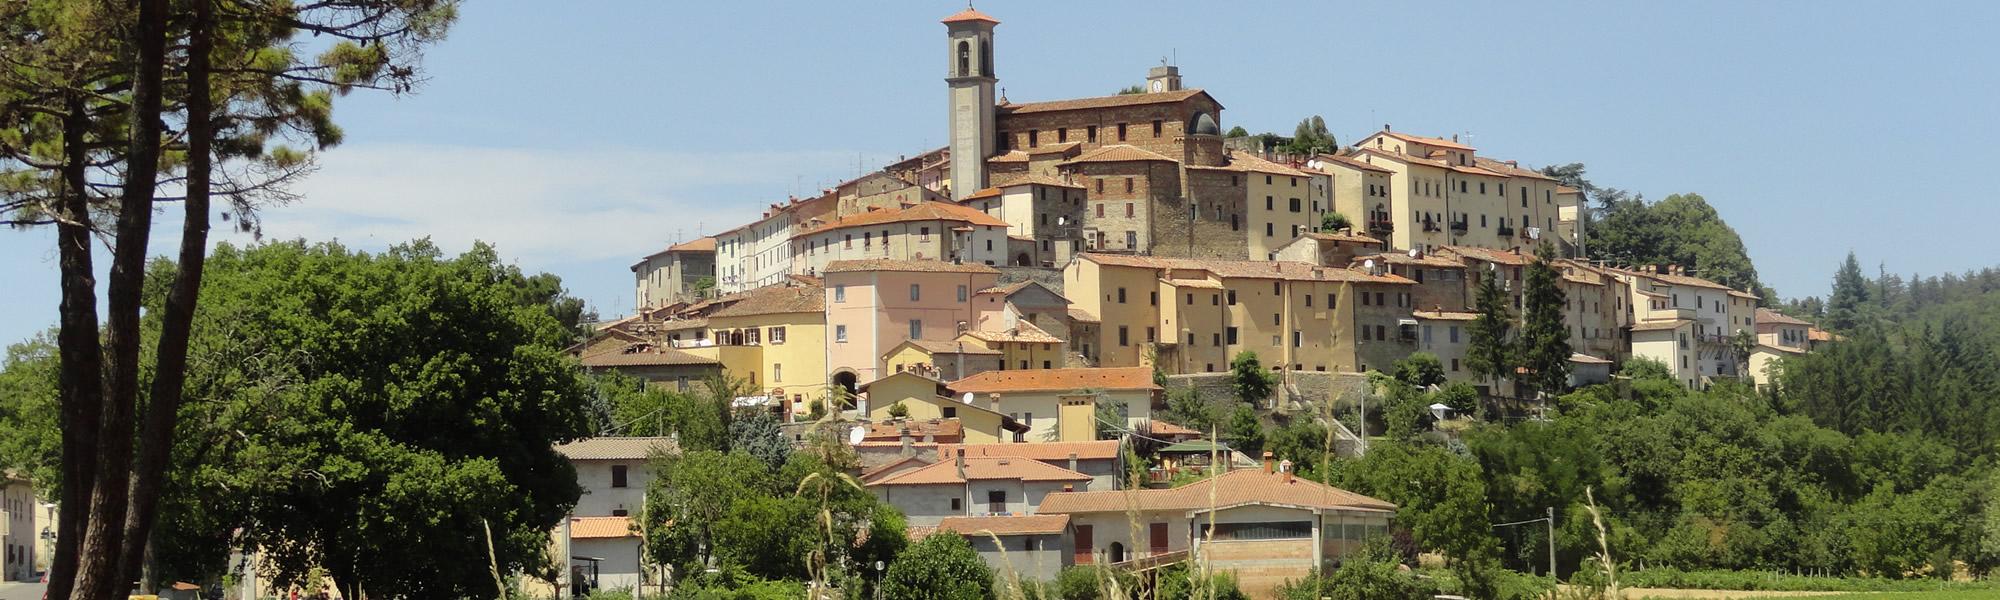 Monterchi in Toscana con vista sulla Valtiberina